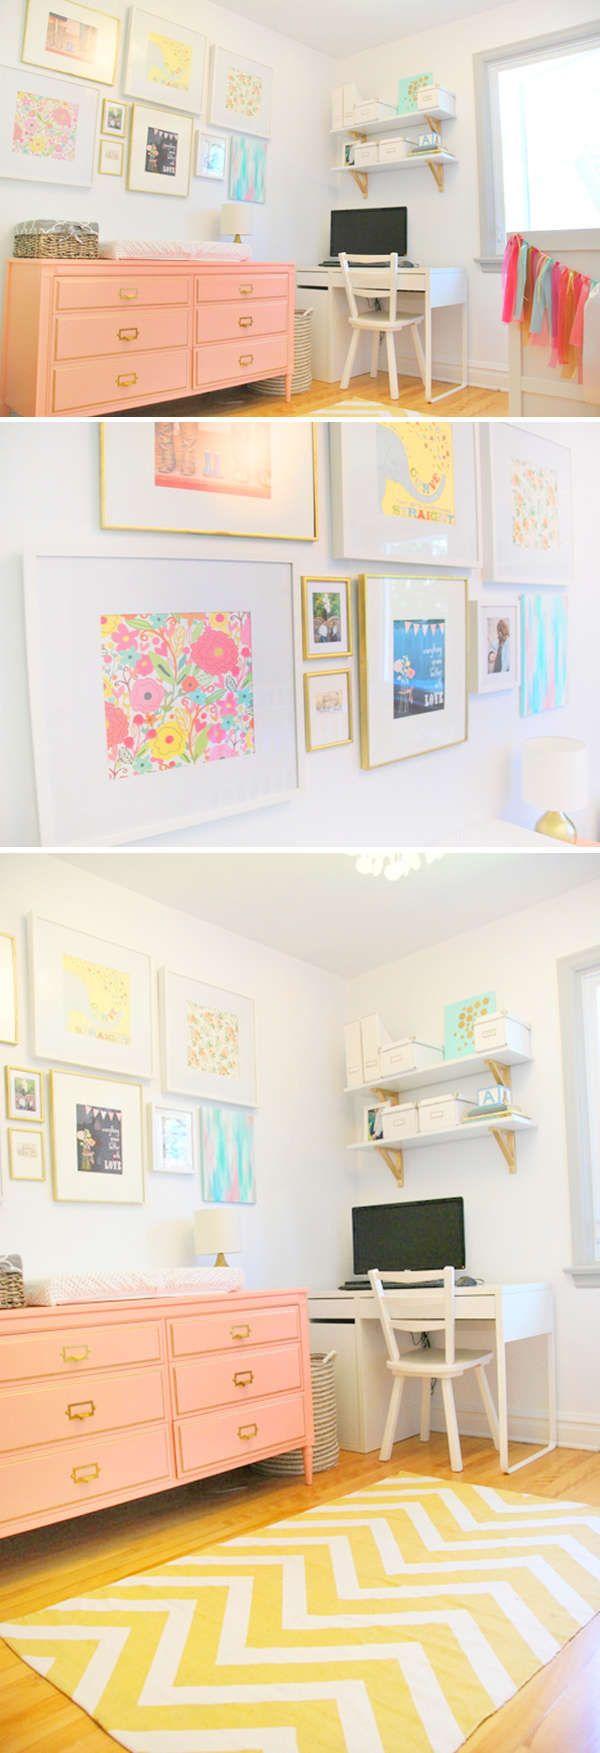 best nursery planning images on pinterest child room